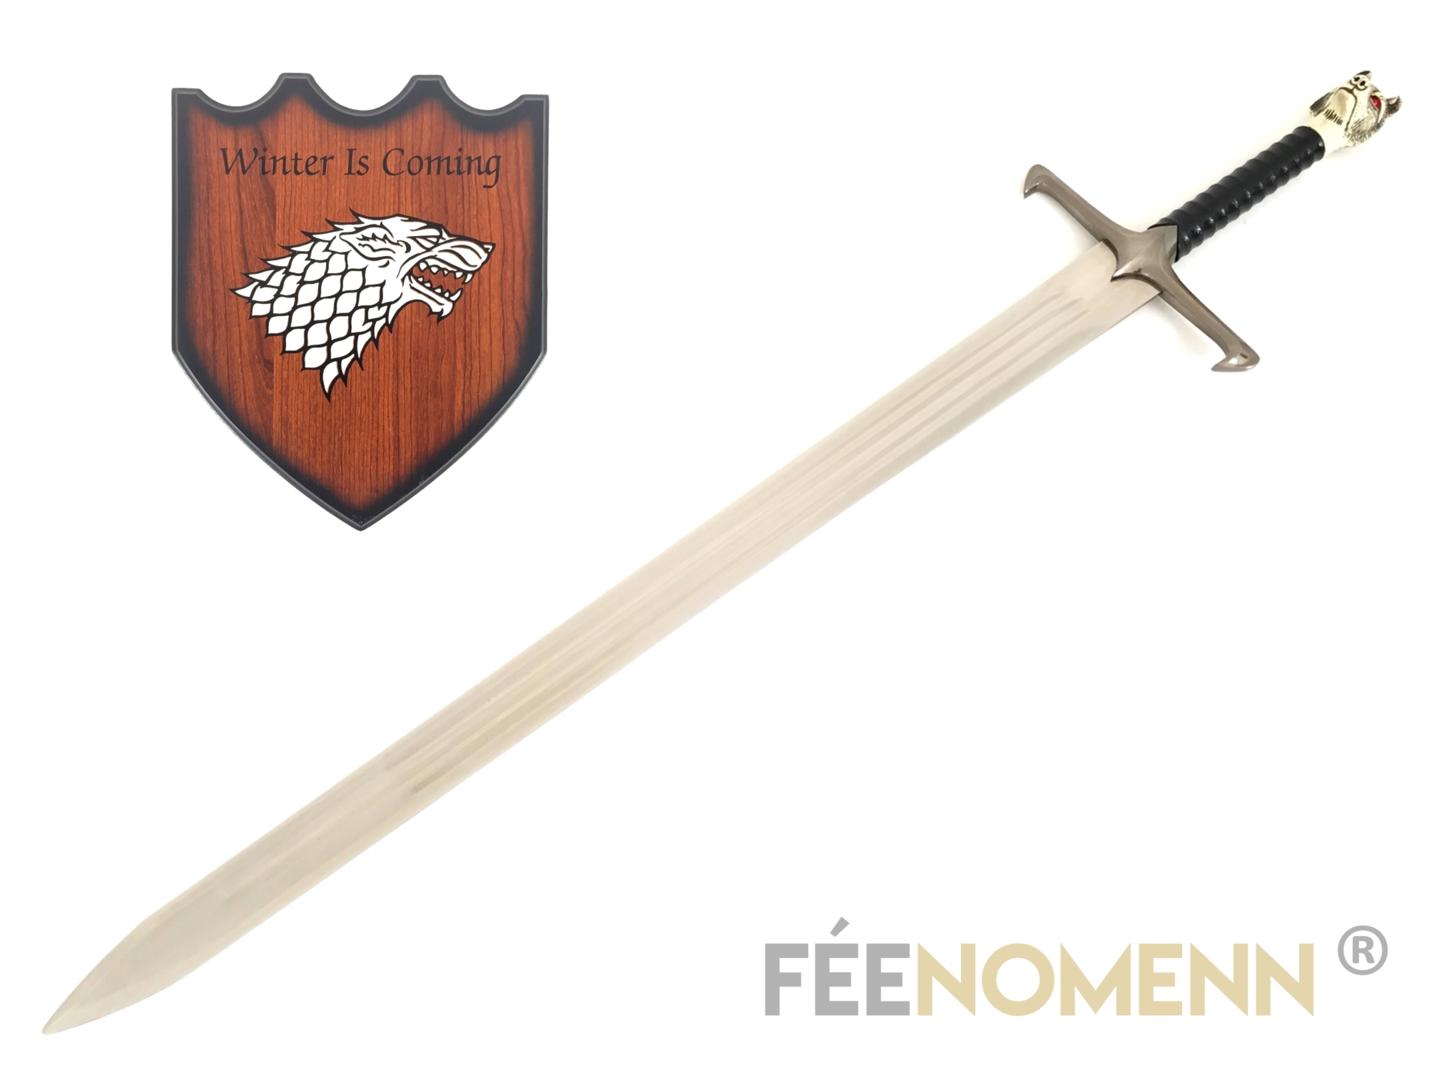 réplique épée game of thrones